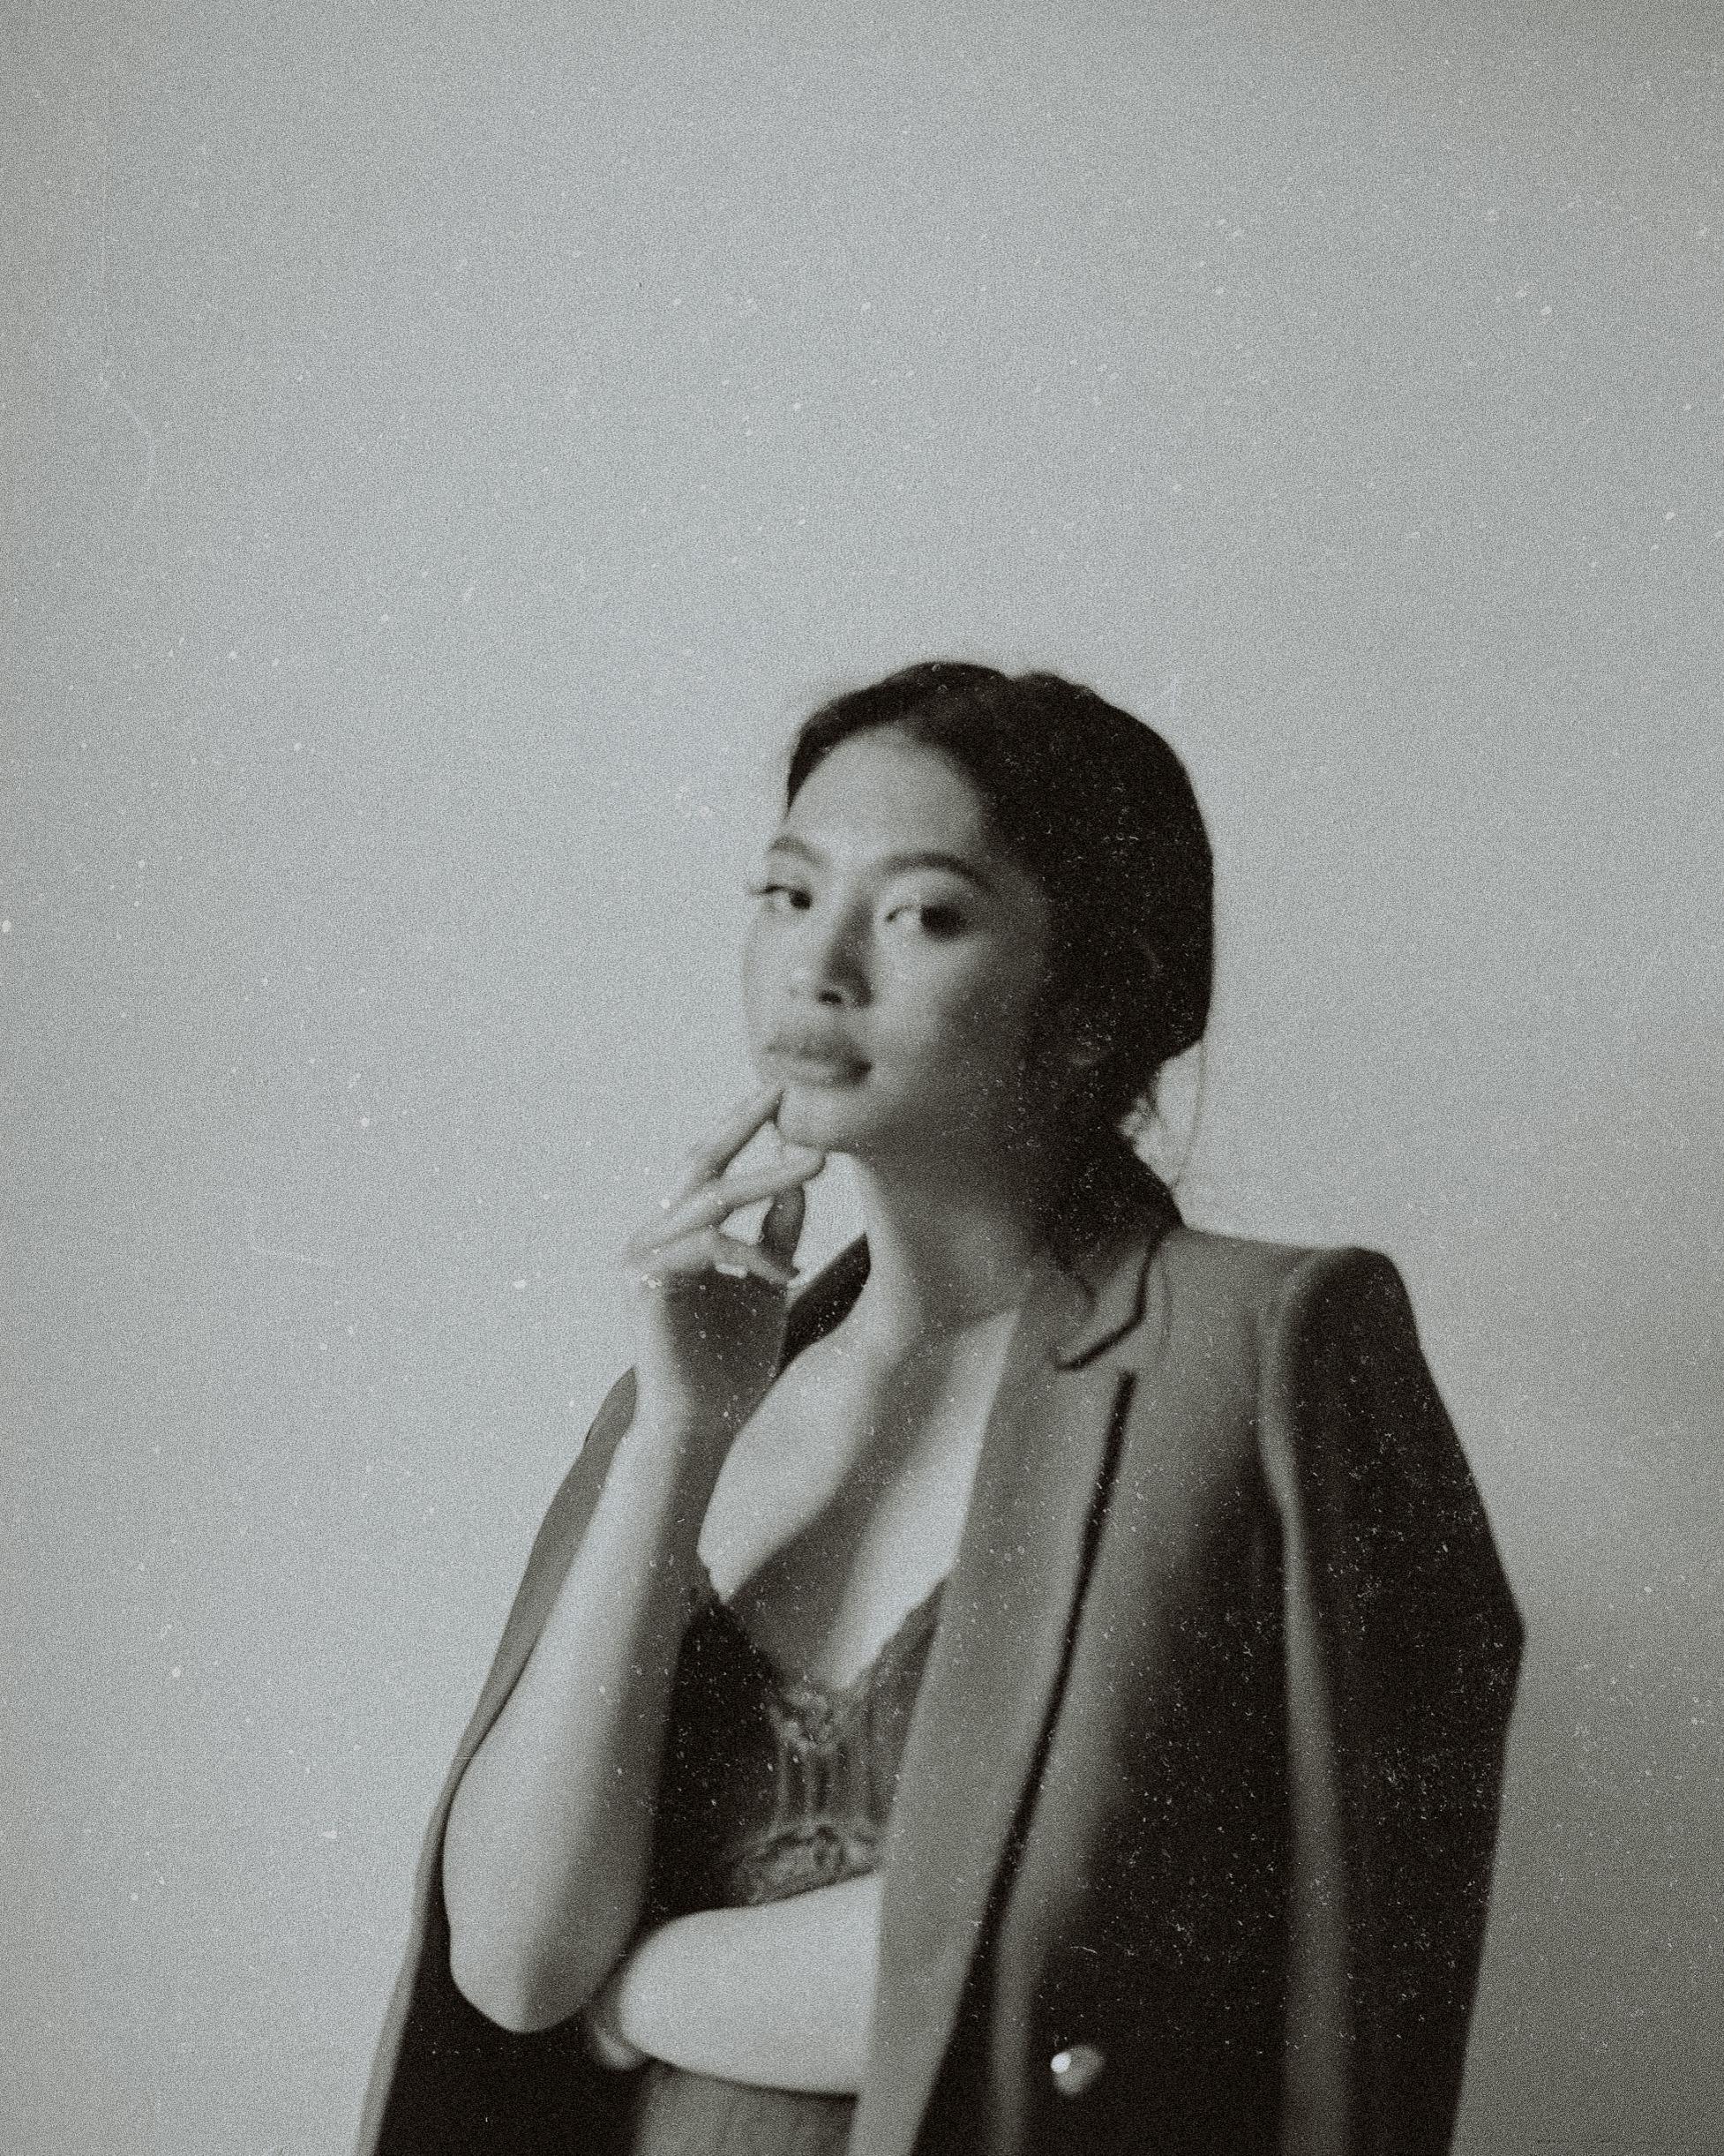 Soft focus film portrait - Jonny Noakes Photographer & Filmmaker